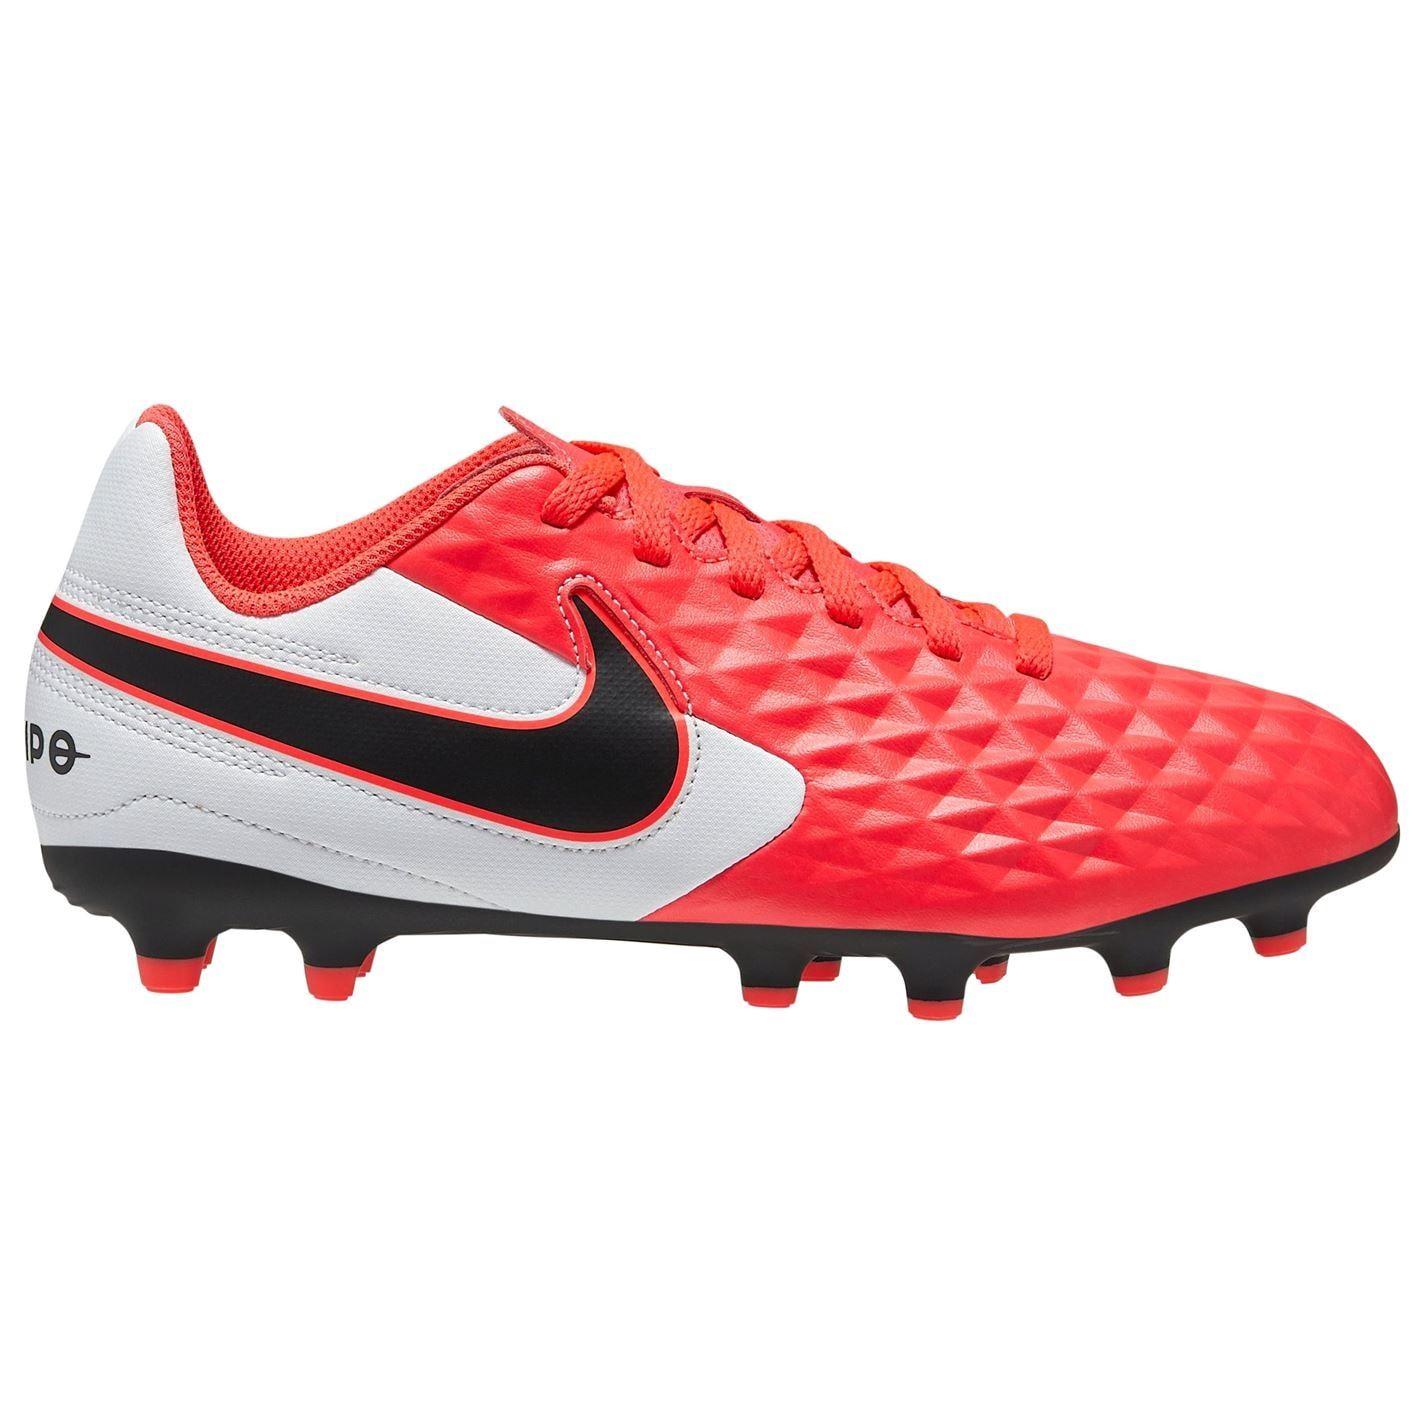 miniature 21 - Nike-Tiempo-Legend-Academy-Junior-FG-Firm-Ground-football-boots-Boys-Football